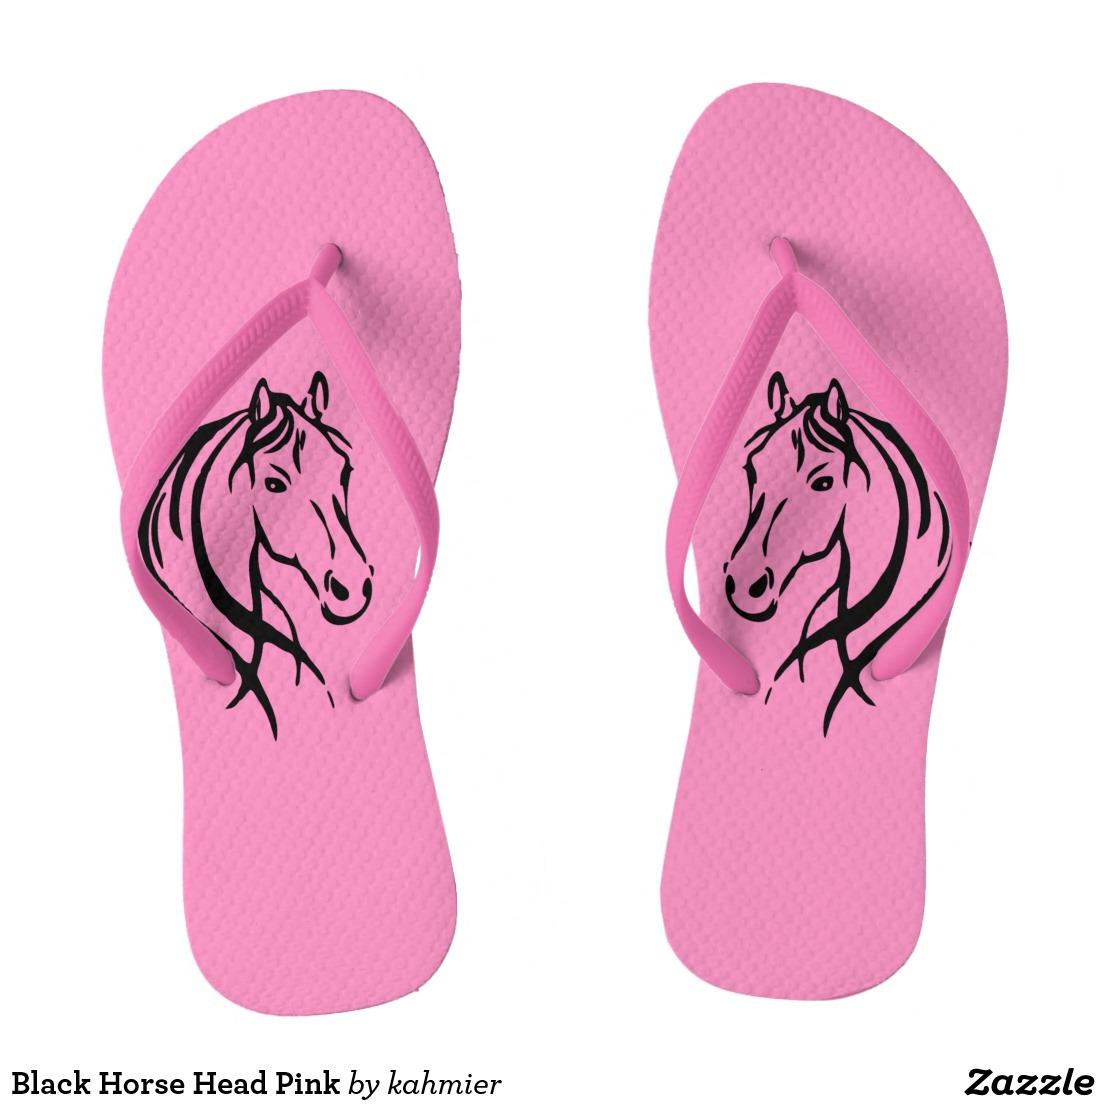 Black Horse Head Pink Flip Flops